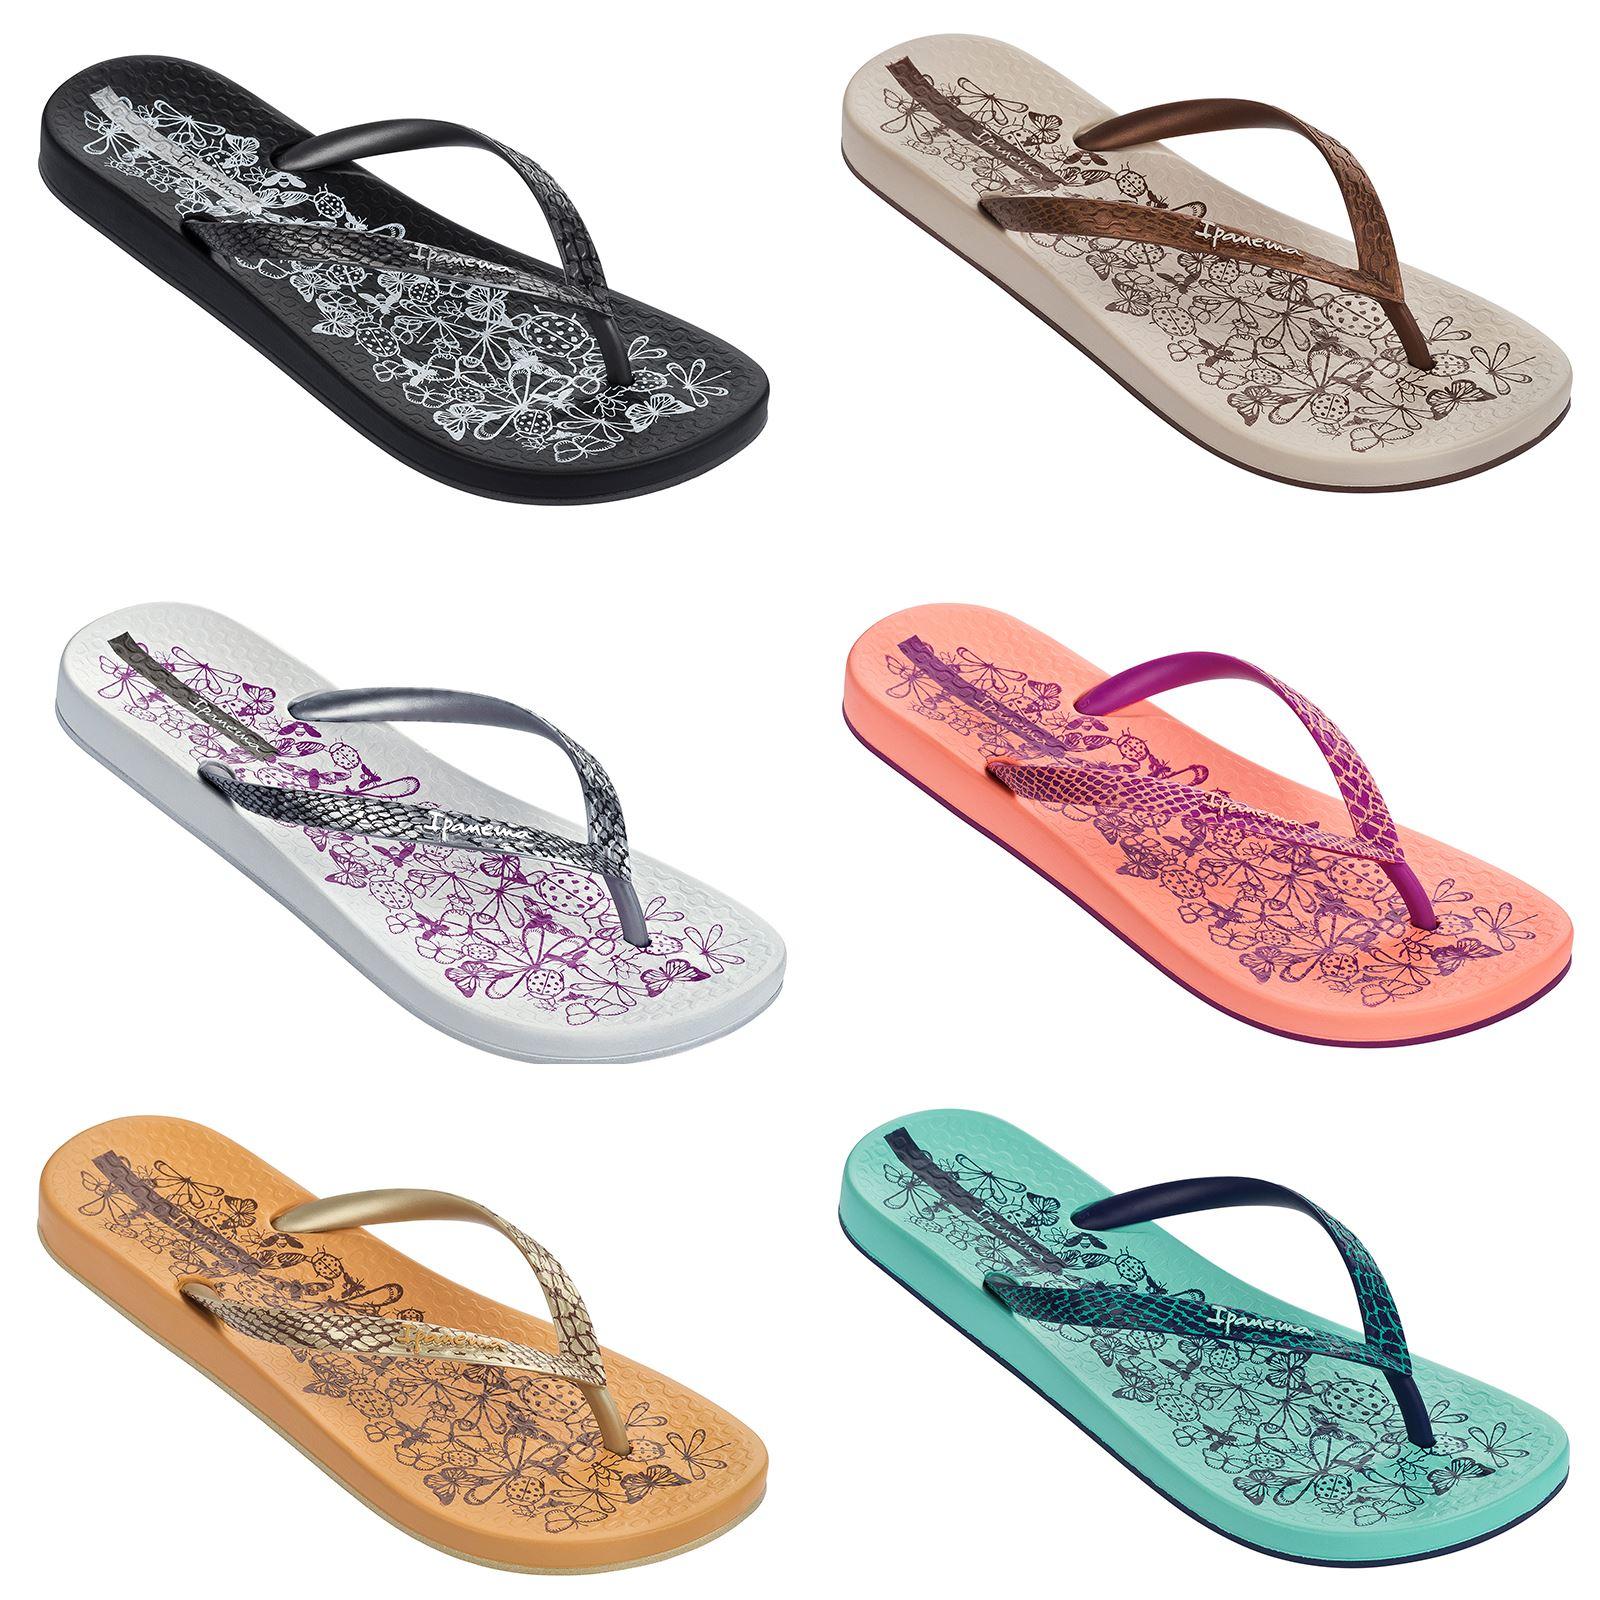 249e8b787d01 Details about Ipanema Nature Slim Footbed Flip Flops Beach Sandals Flowers  Print 81926